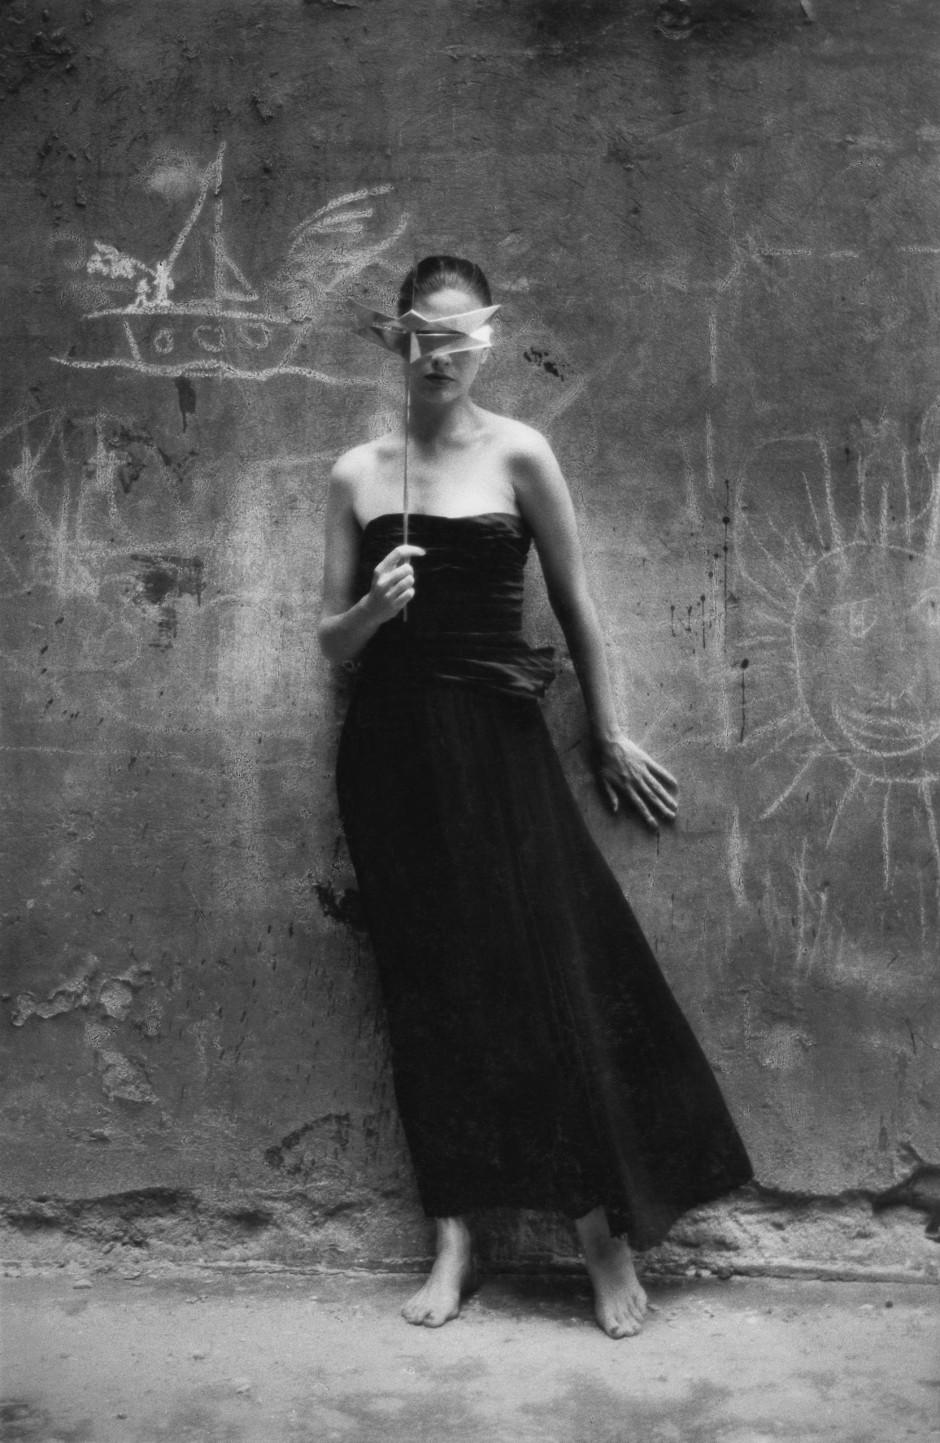 Sibylle Bergemann, Maren, Berlin, 1989